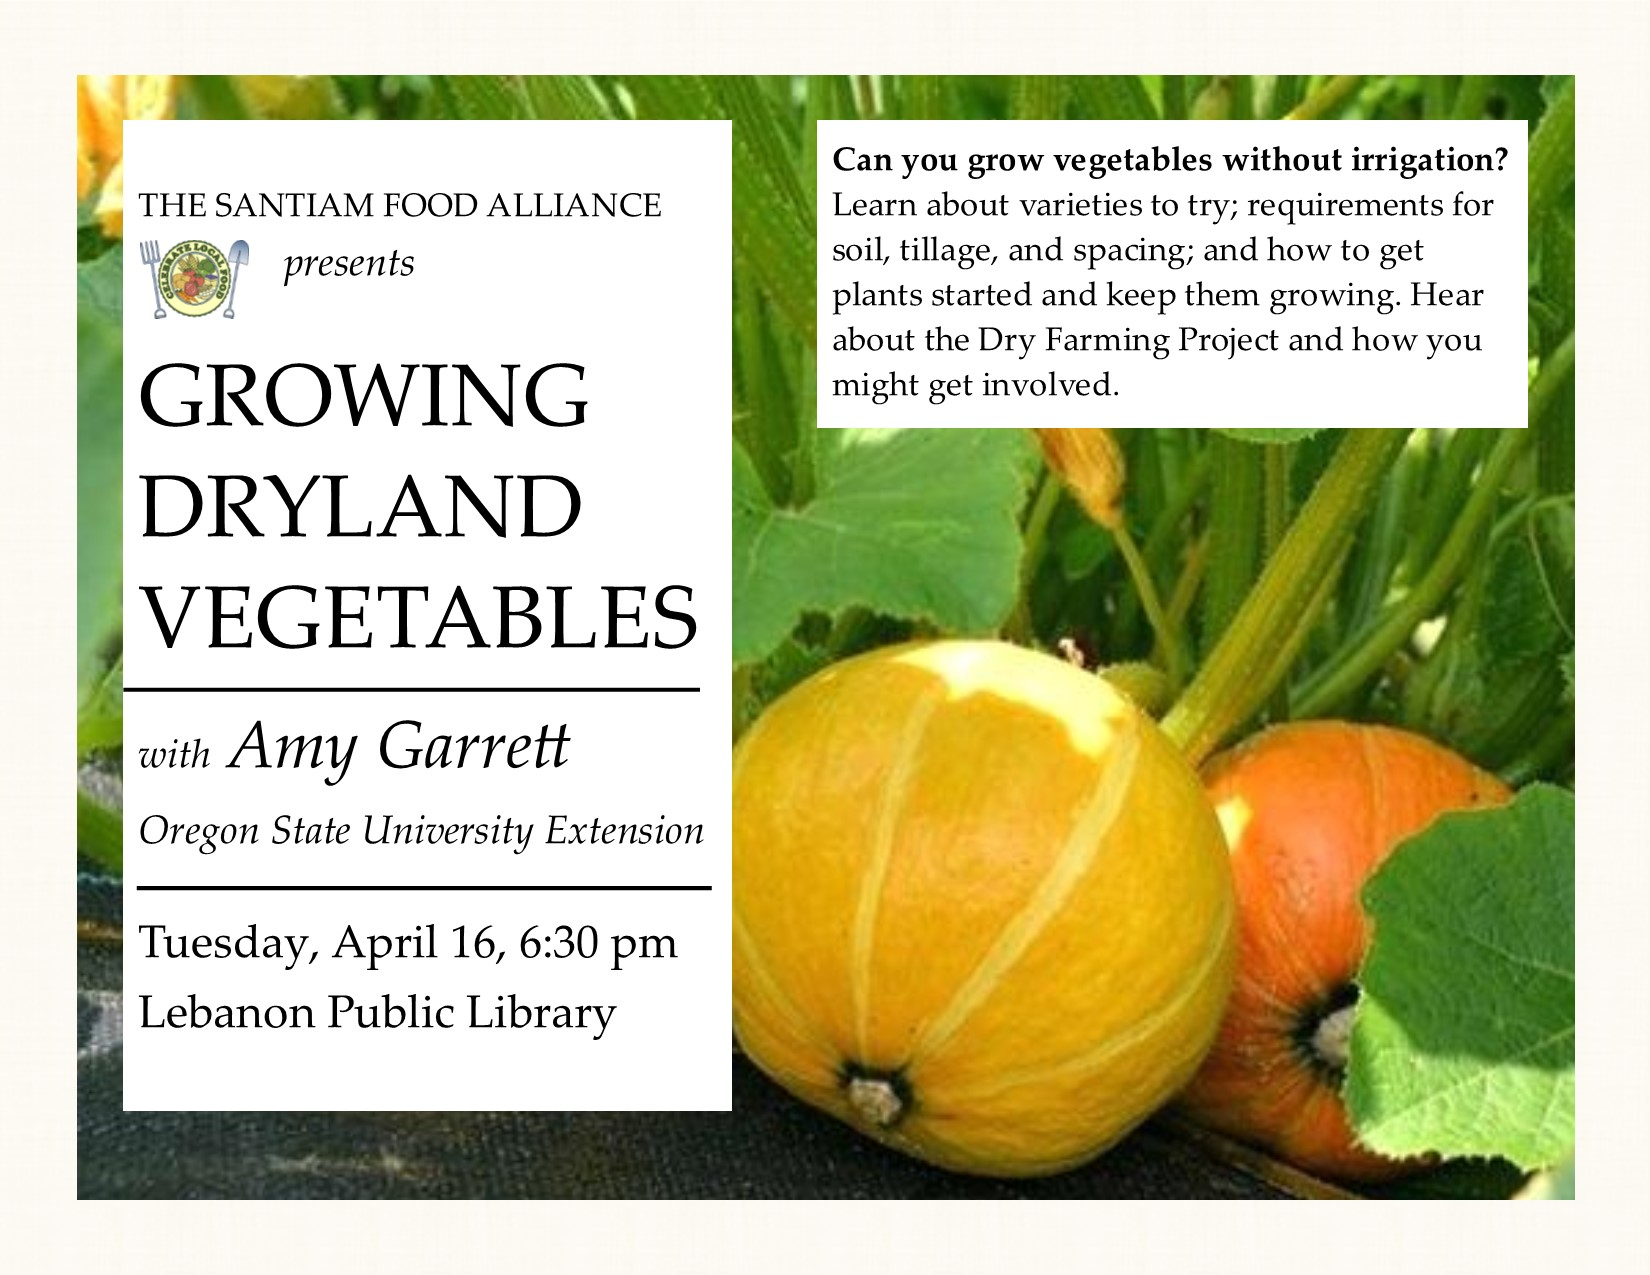 Dryland gardening flyer